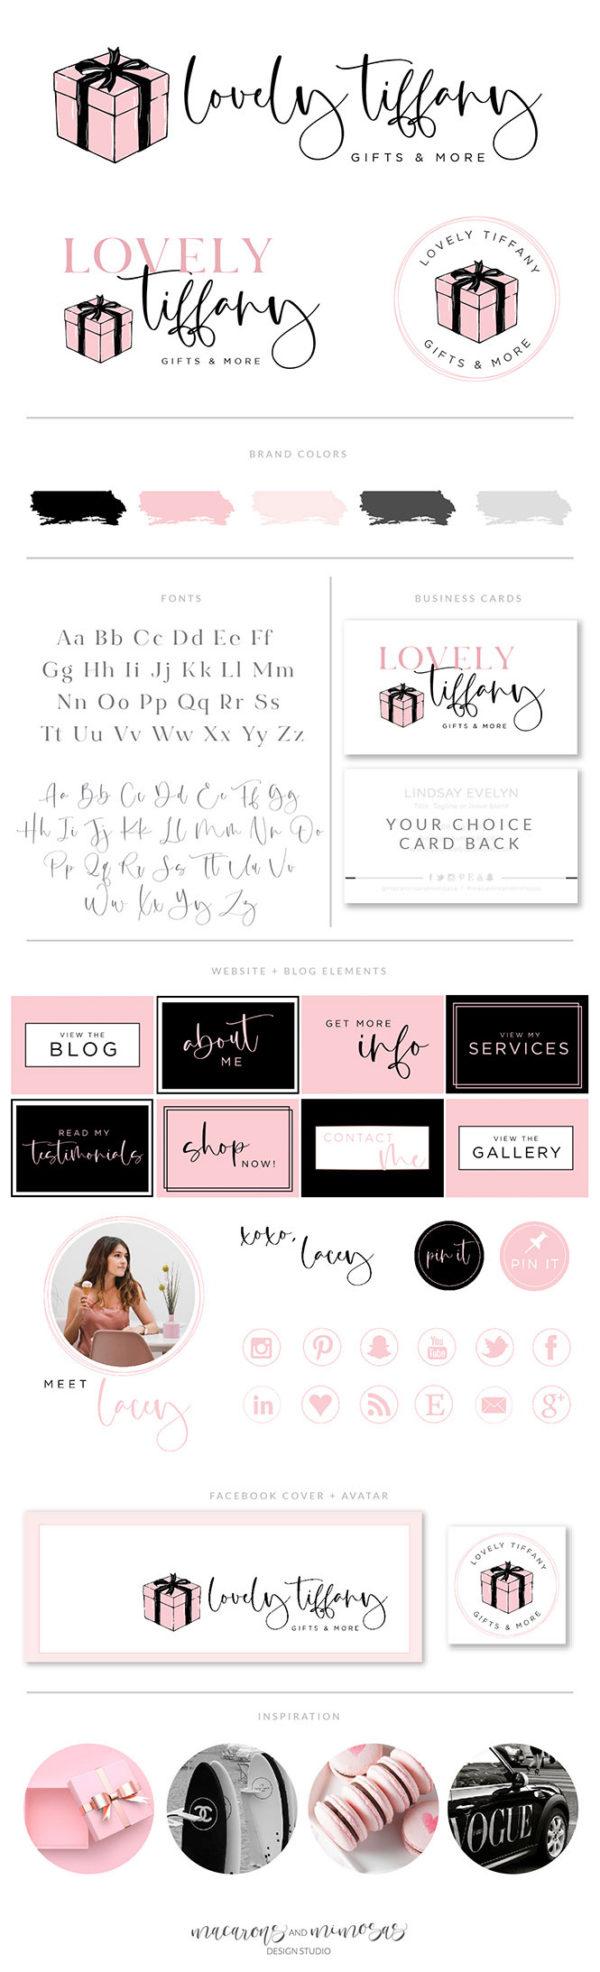 Gift Box Logo Design, Gift Shop Logo for Boutique, Event Company Logo, Premade Cute Bow Logo, Gift Wrapping Company, Pink Ribbon Logo